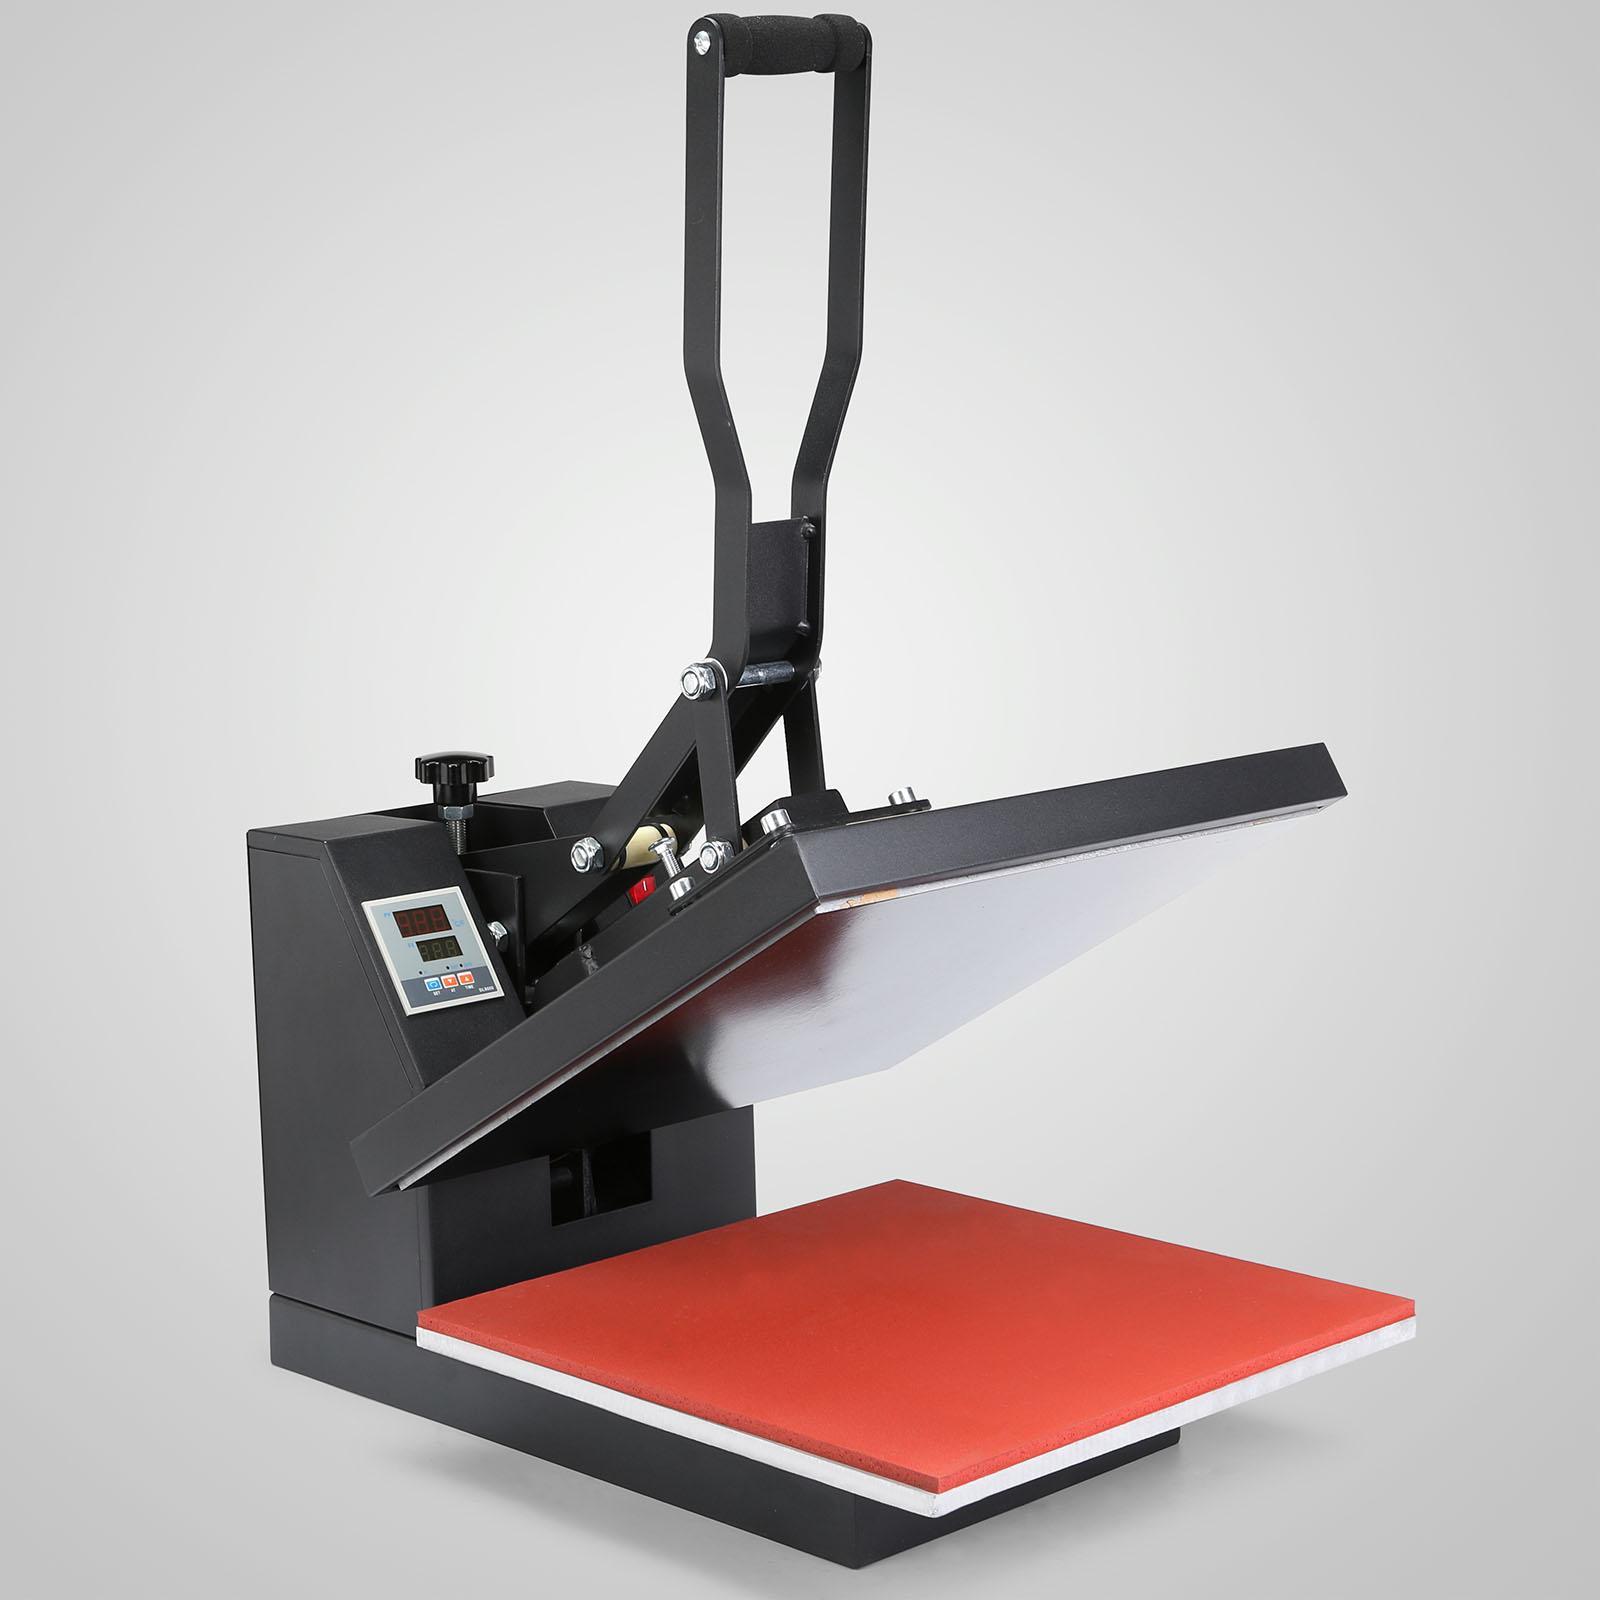 15fd772b9 2019 15 X15 Inch Heat Transfer Vinyl 38X38 Cm T Shirt Heat Press Machine  From Sihao, $185.93 | DHgate.Com